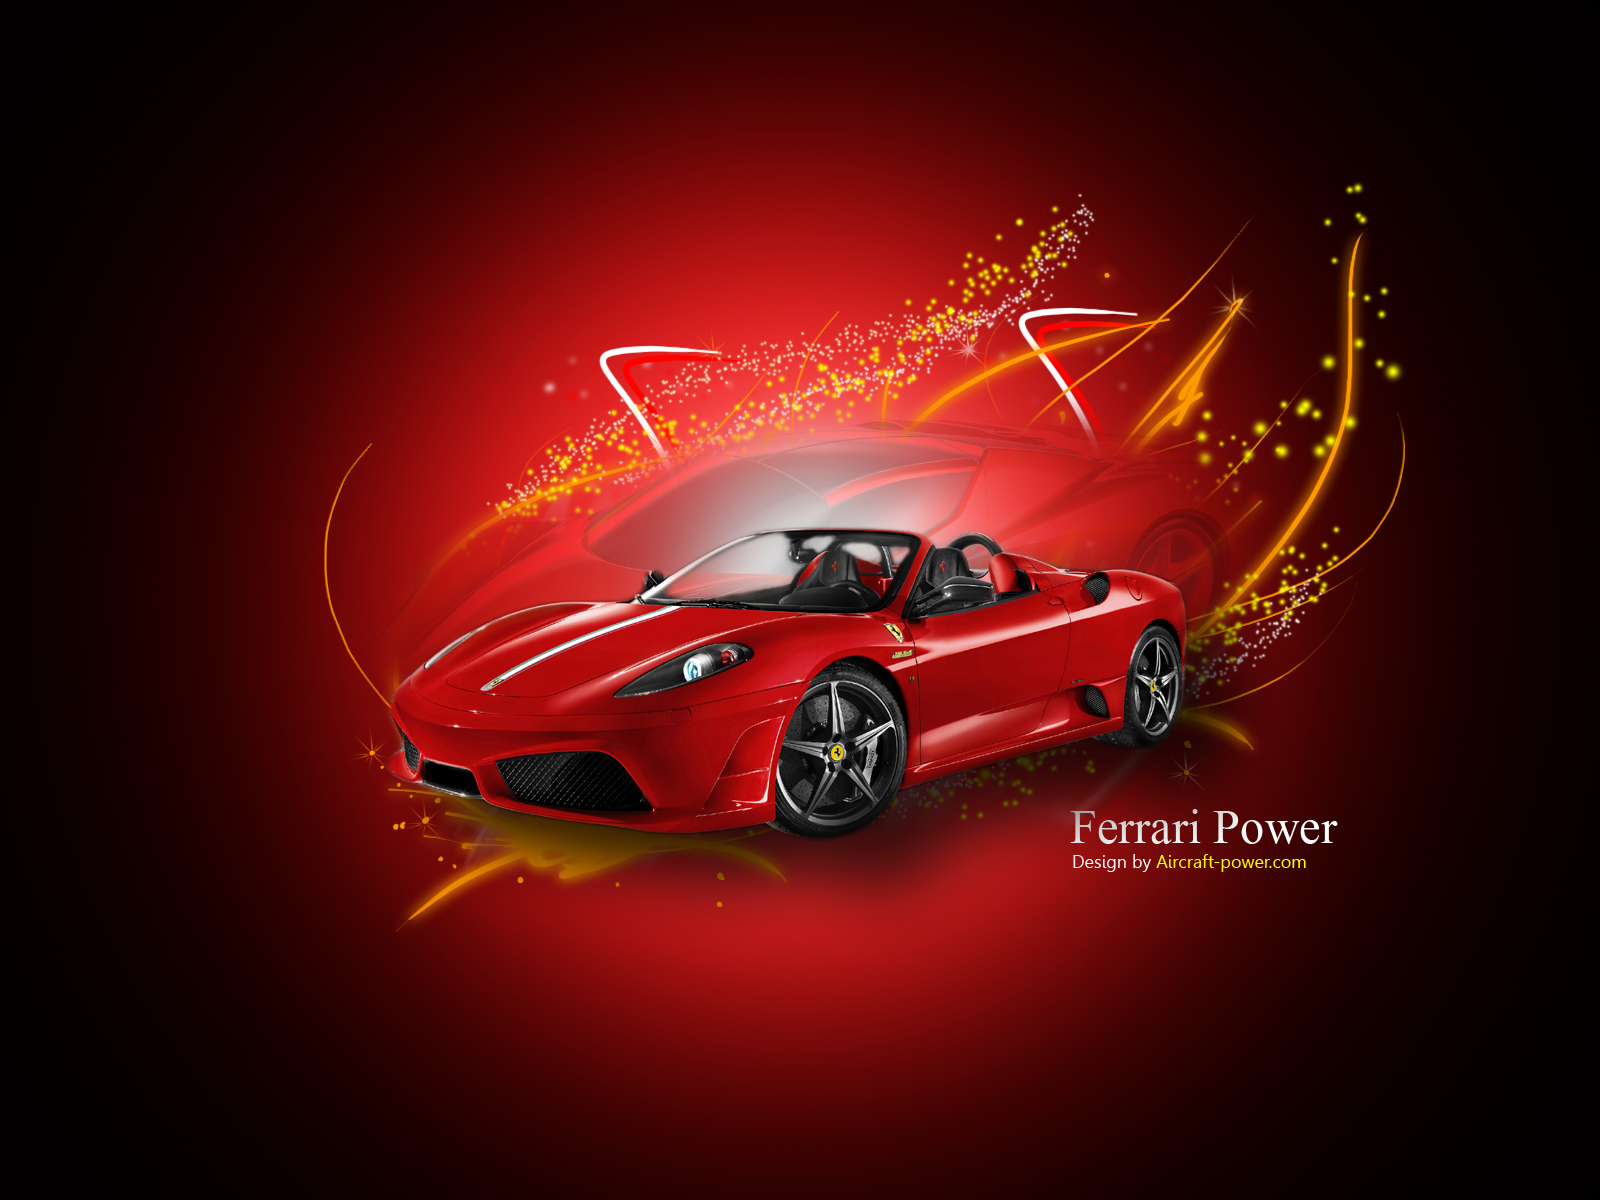 car wallpaper zedge lovely zedge car wallpapers aœ enam wallpaper. Ferrari Wallpapers On Wallpaperdog